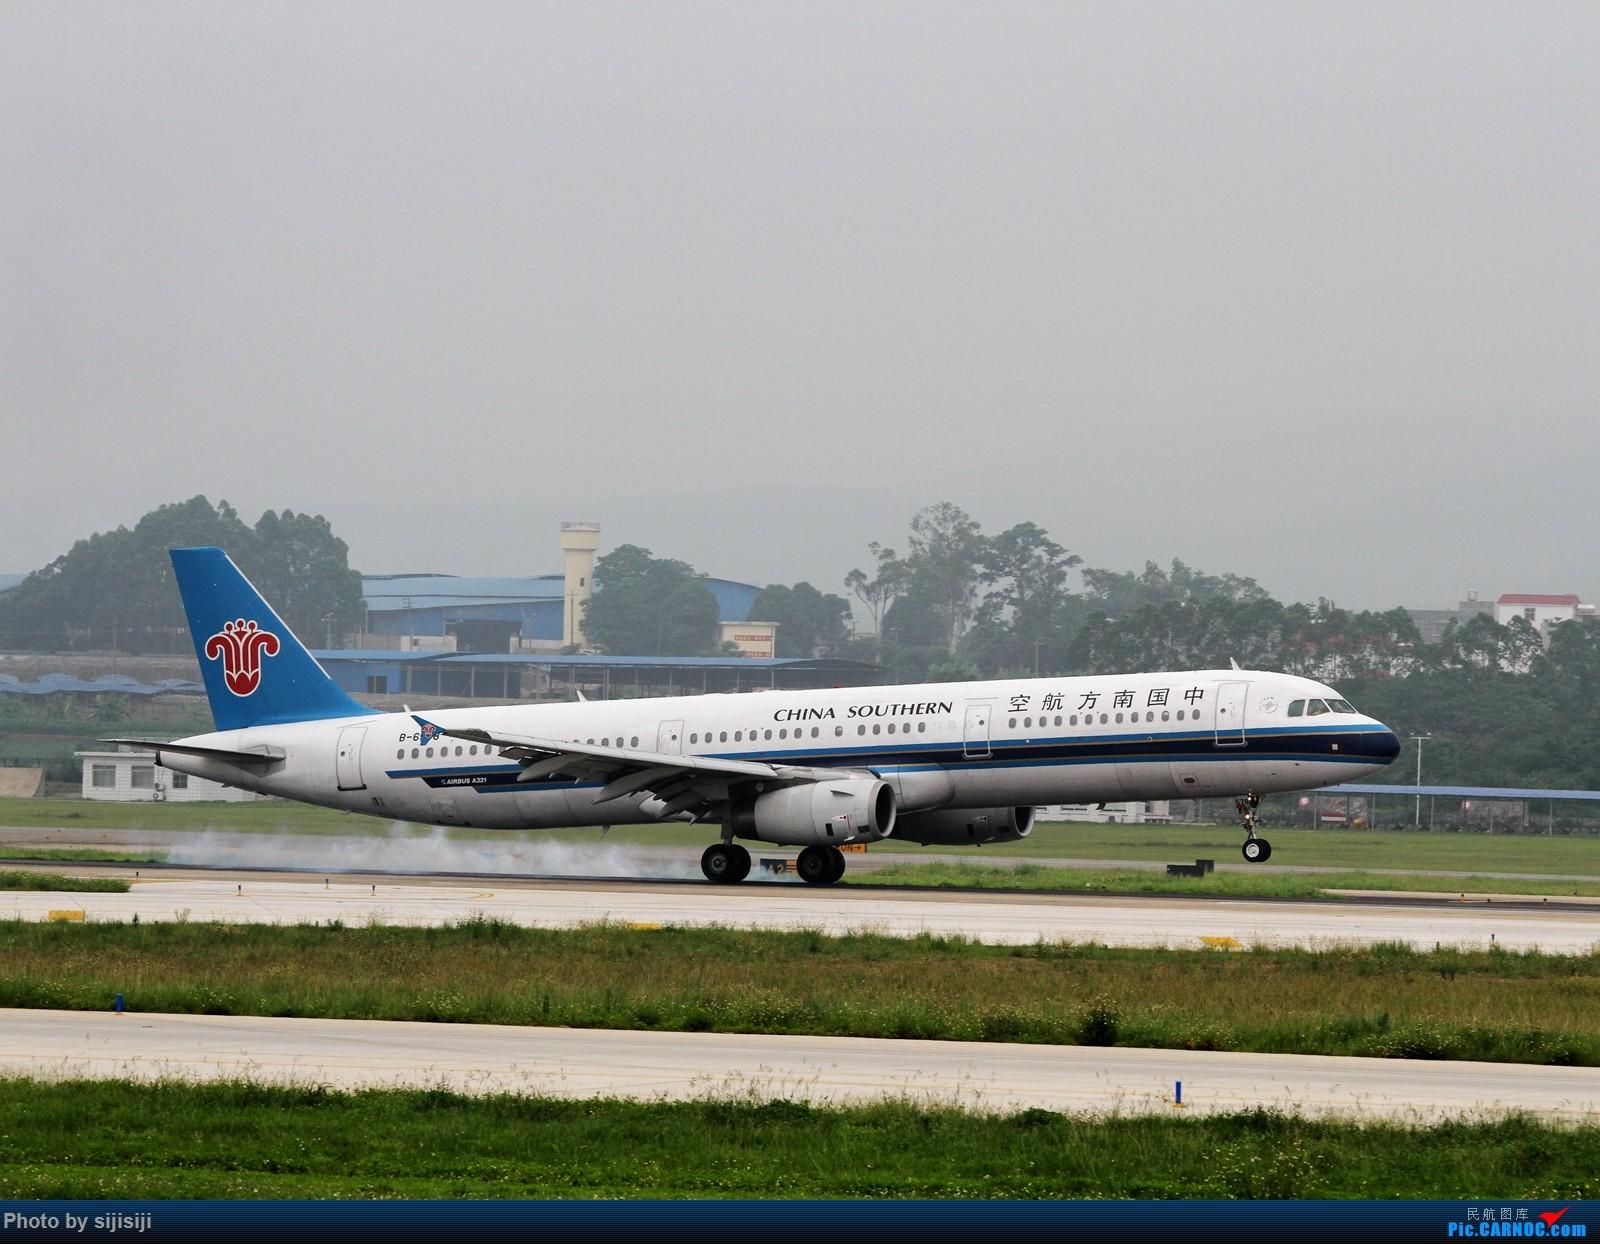 Re:[原创]【NNG飞友】屌丝村口迎来金凤凰,国航332飞抵NNG AIRBUS A321-200 B-6578 中国南宁吴圩国际机场